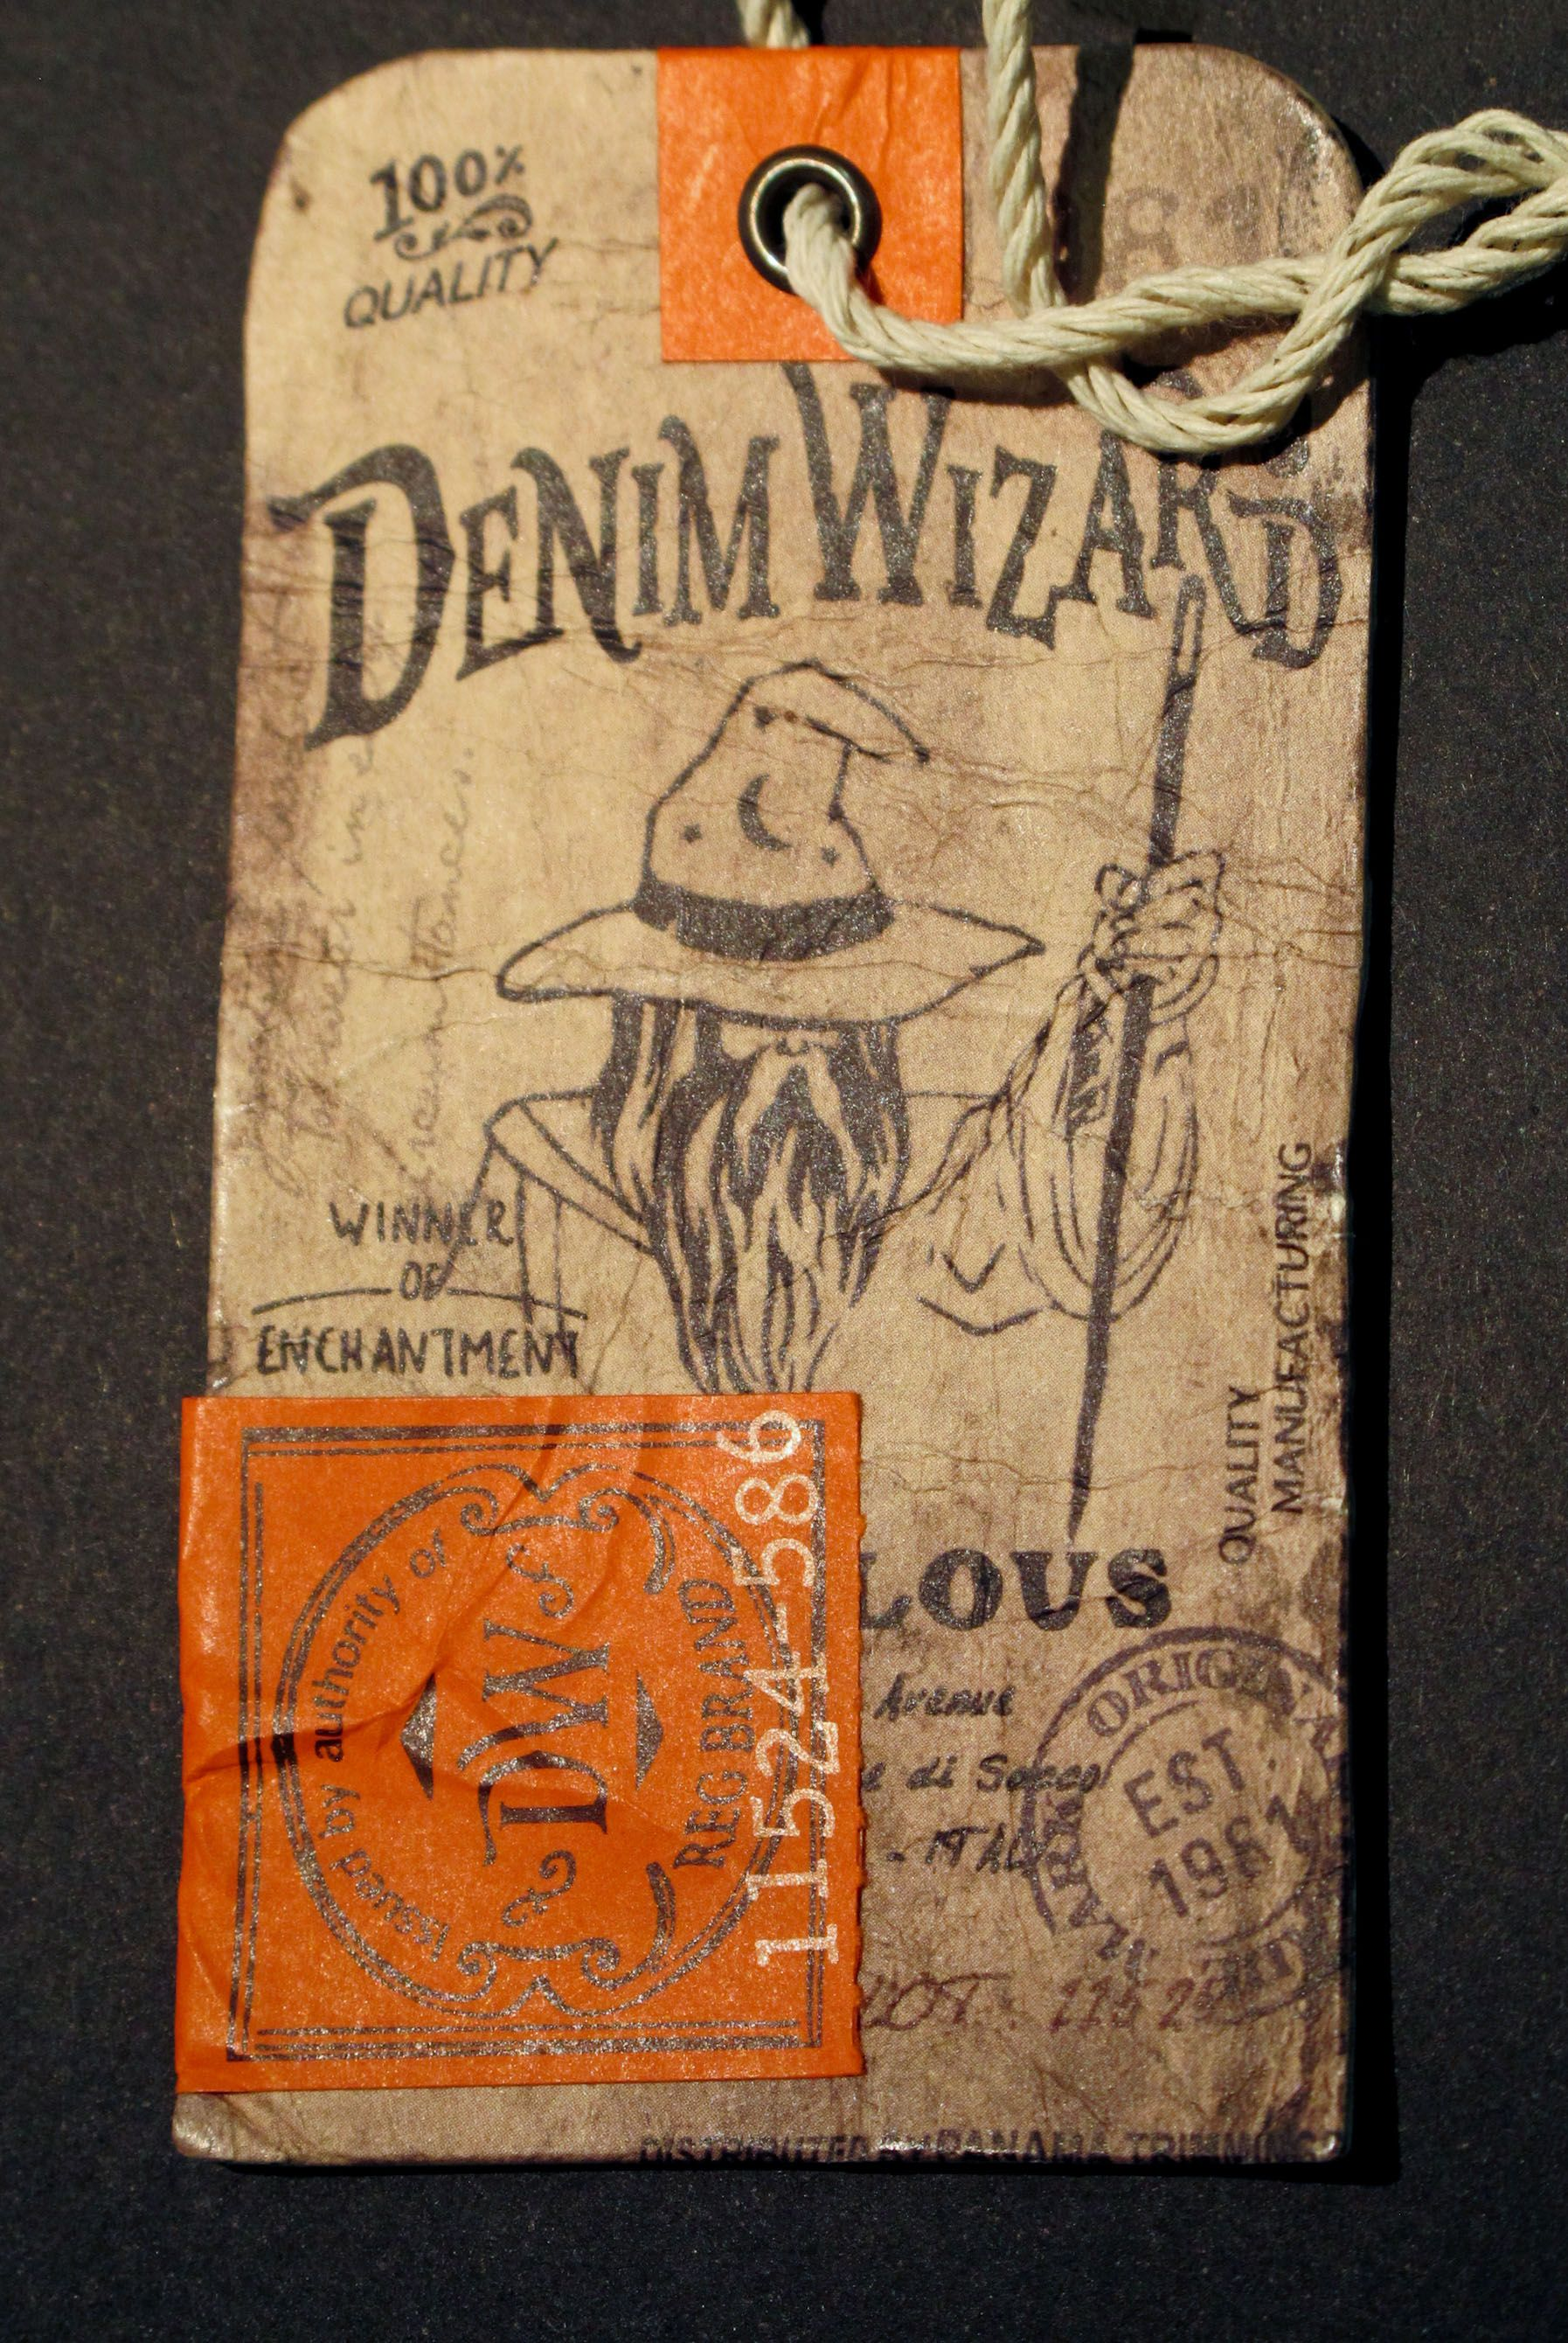 Denim Wizard Hangtag Hang Tags Tag Design Swing Tags